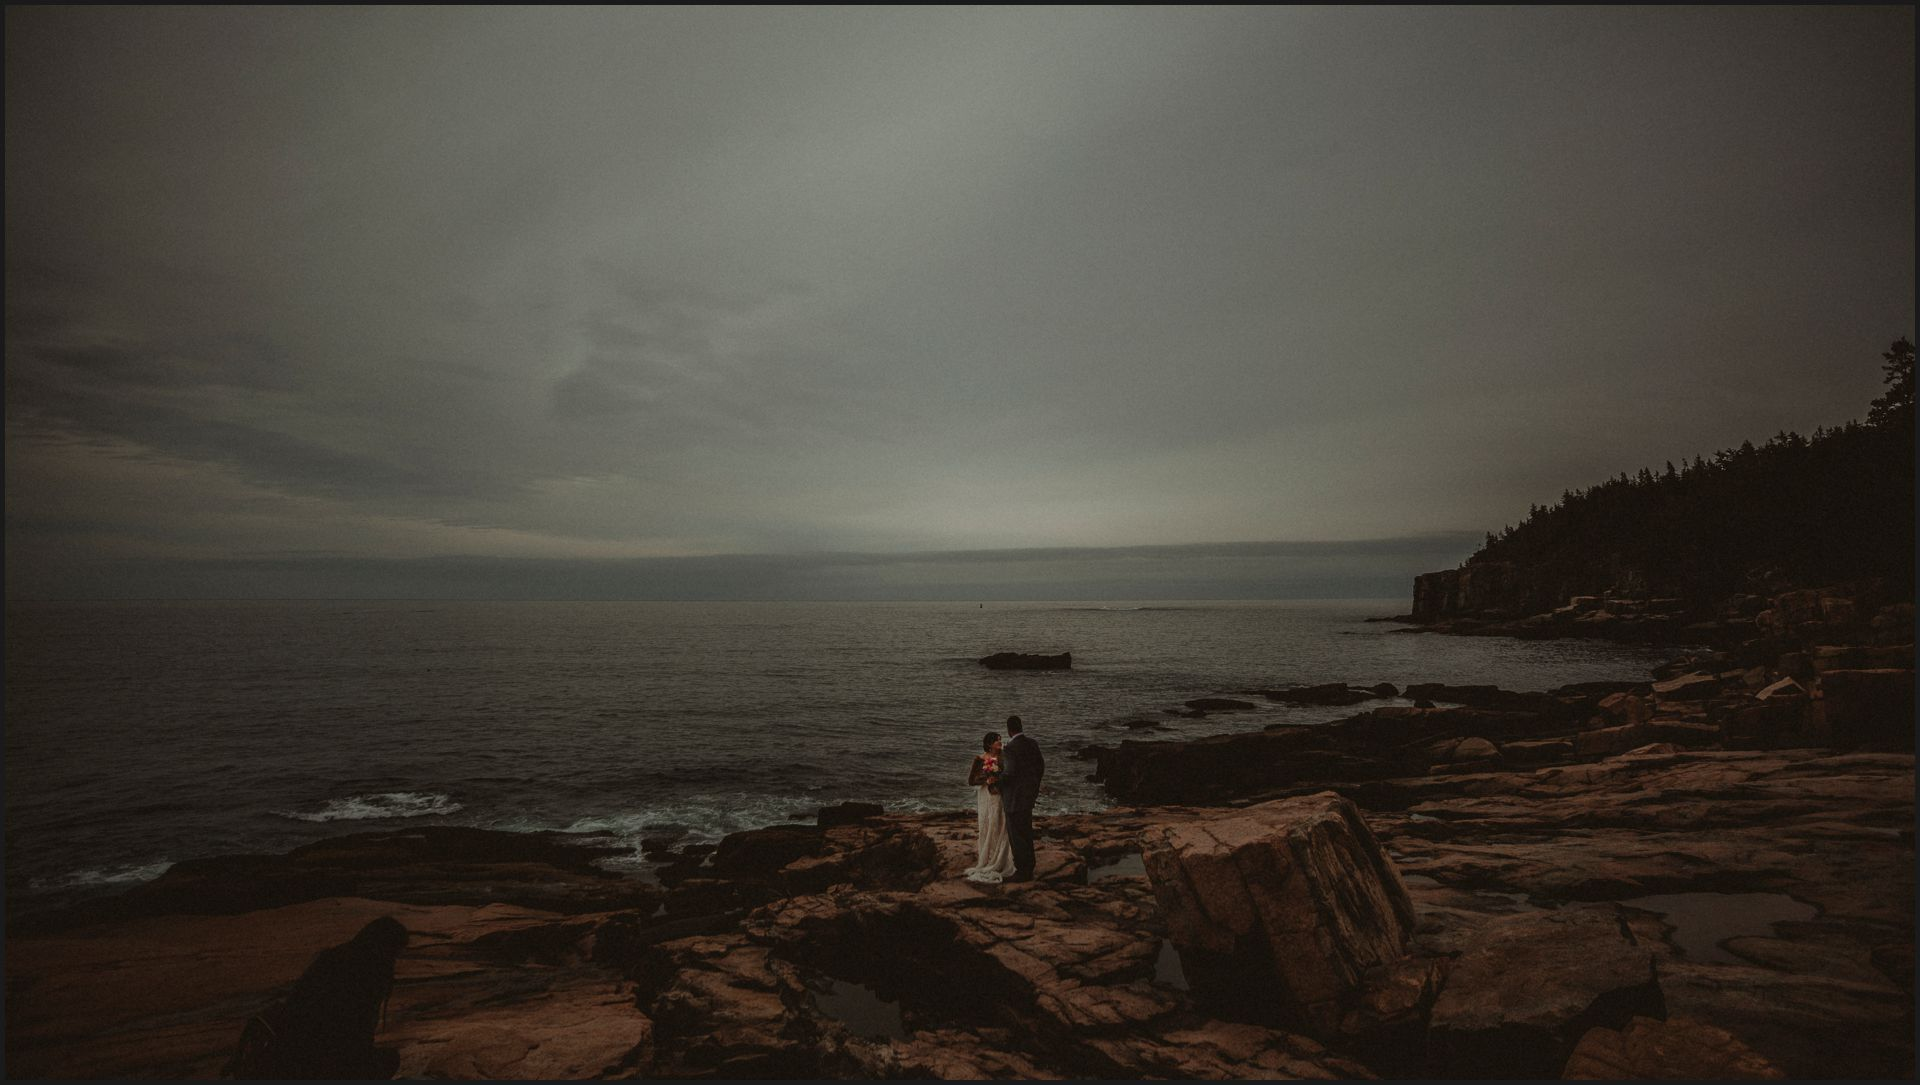 acadia national park, maine, wedding, couple portrait, bride, groom, drama